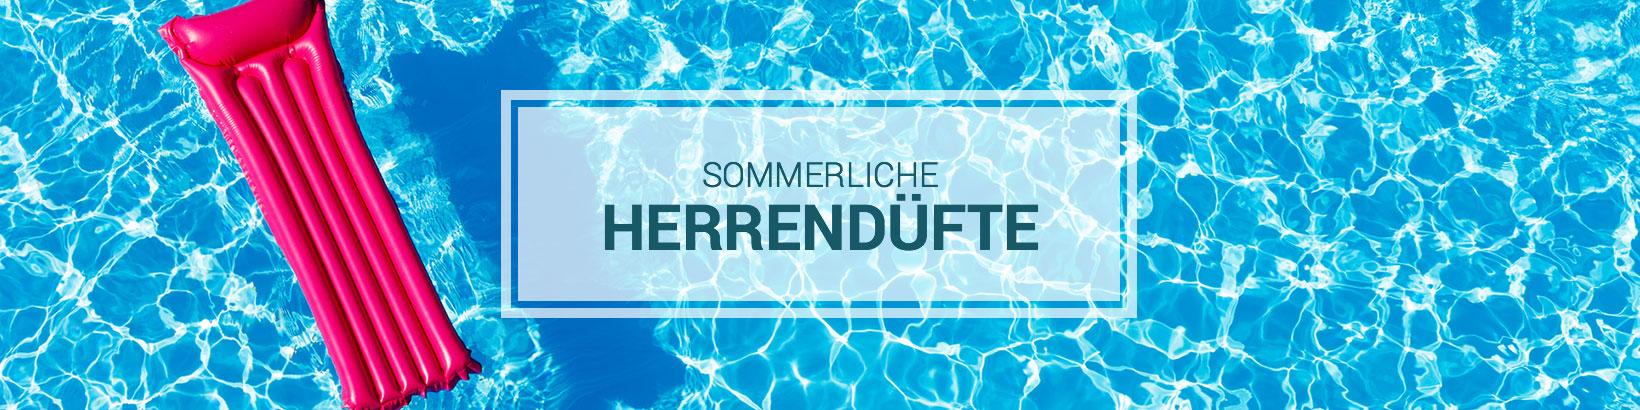 visual-sommerwelt-herrenduefte-header